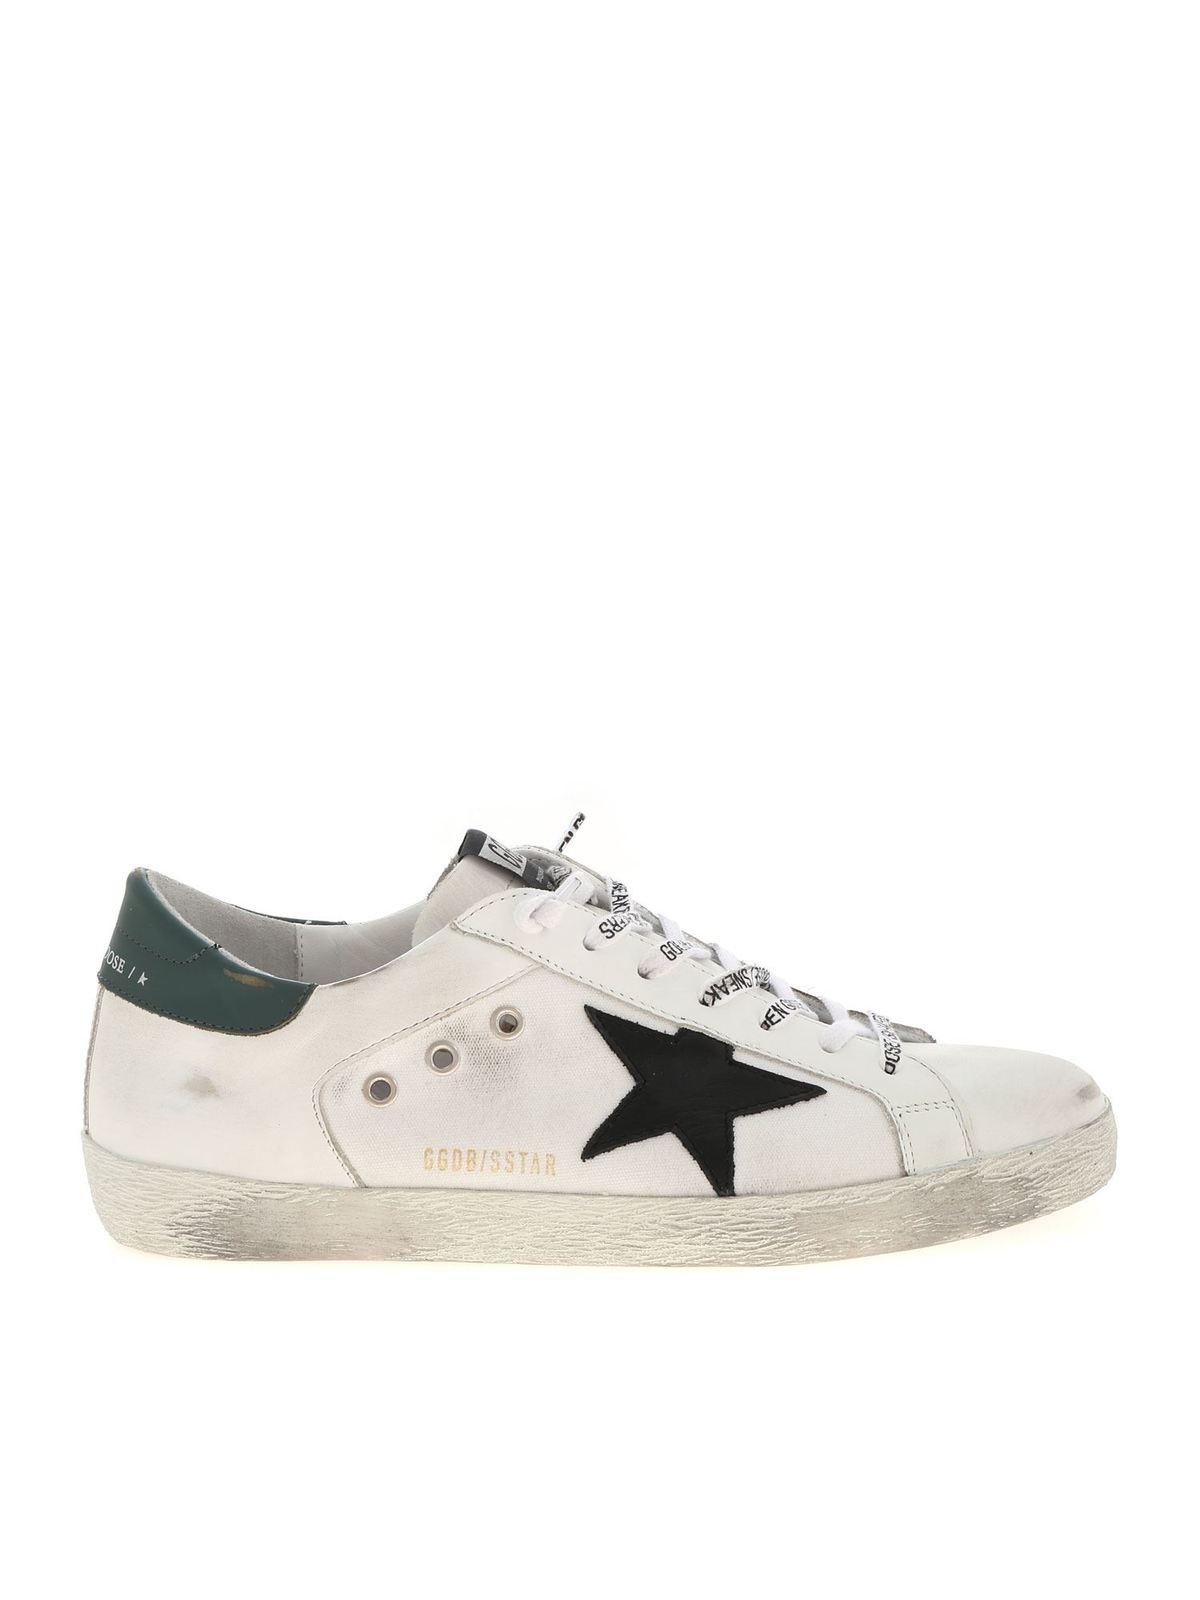 Golden Goose - Superstar white sneakers